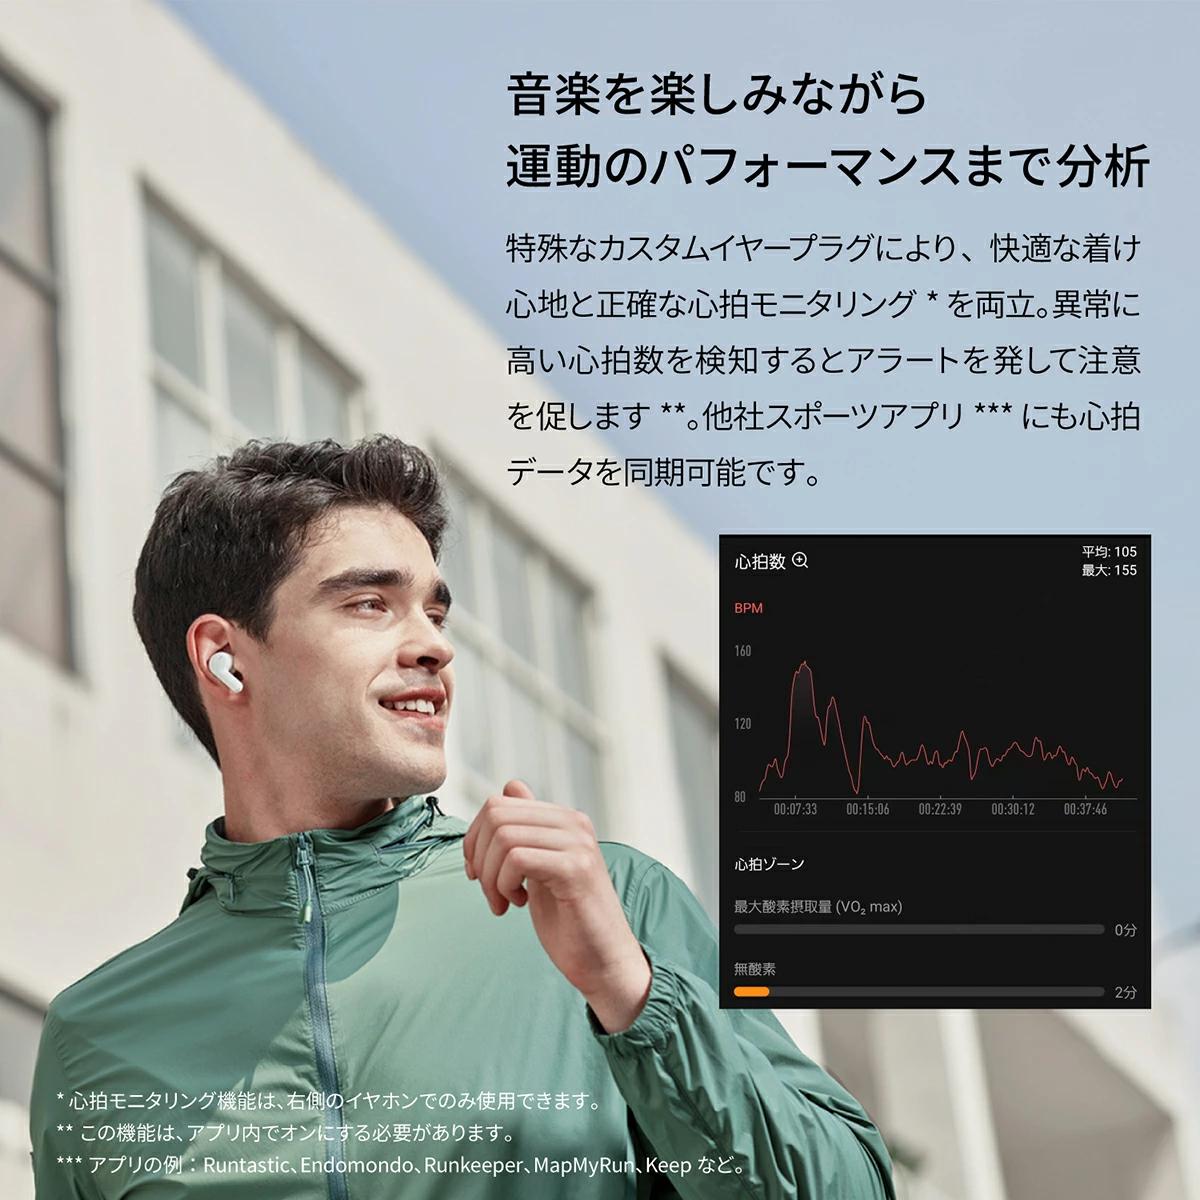 画像引用元:https://item.rakuten.co.jp/amazfit/su190003/